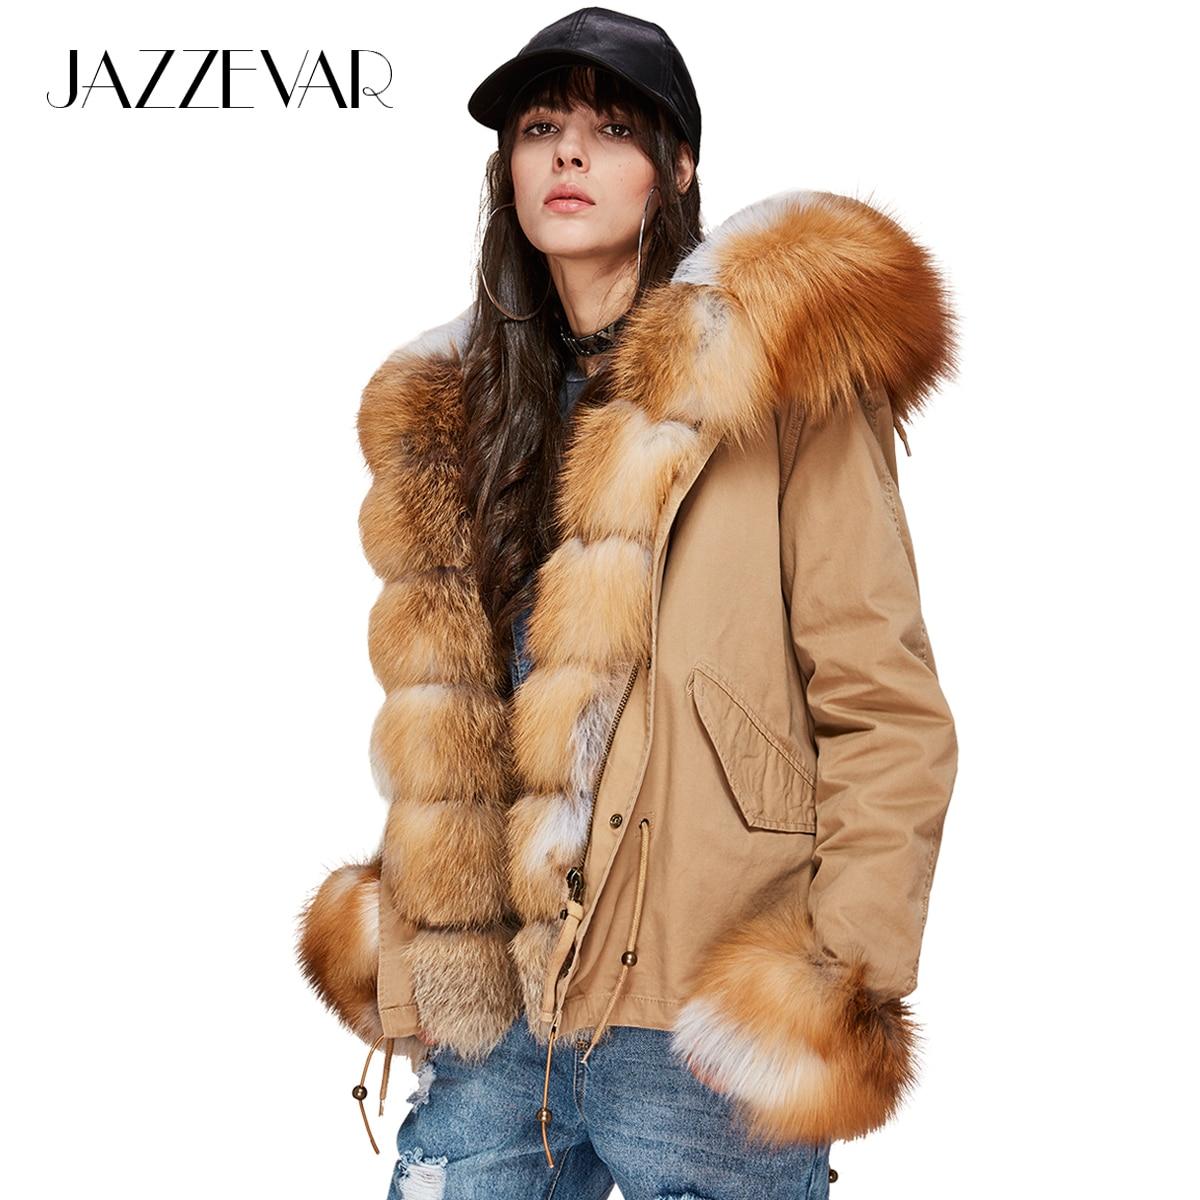 JAZZEVAR 2019 New Fashion Women's Luxurious Large Real Fox Fur Collar Cuff Hooded Coat Short   Parkas   Outwear Winter Jacket